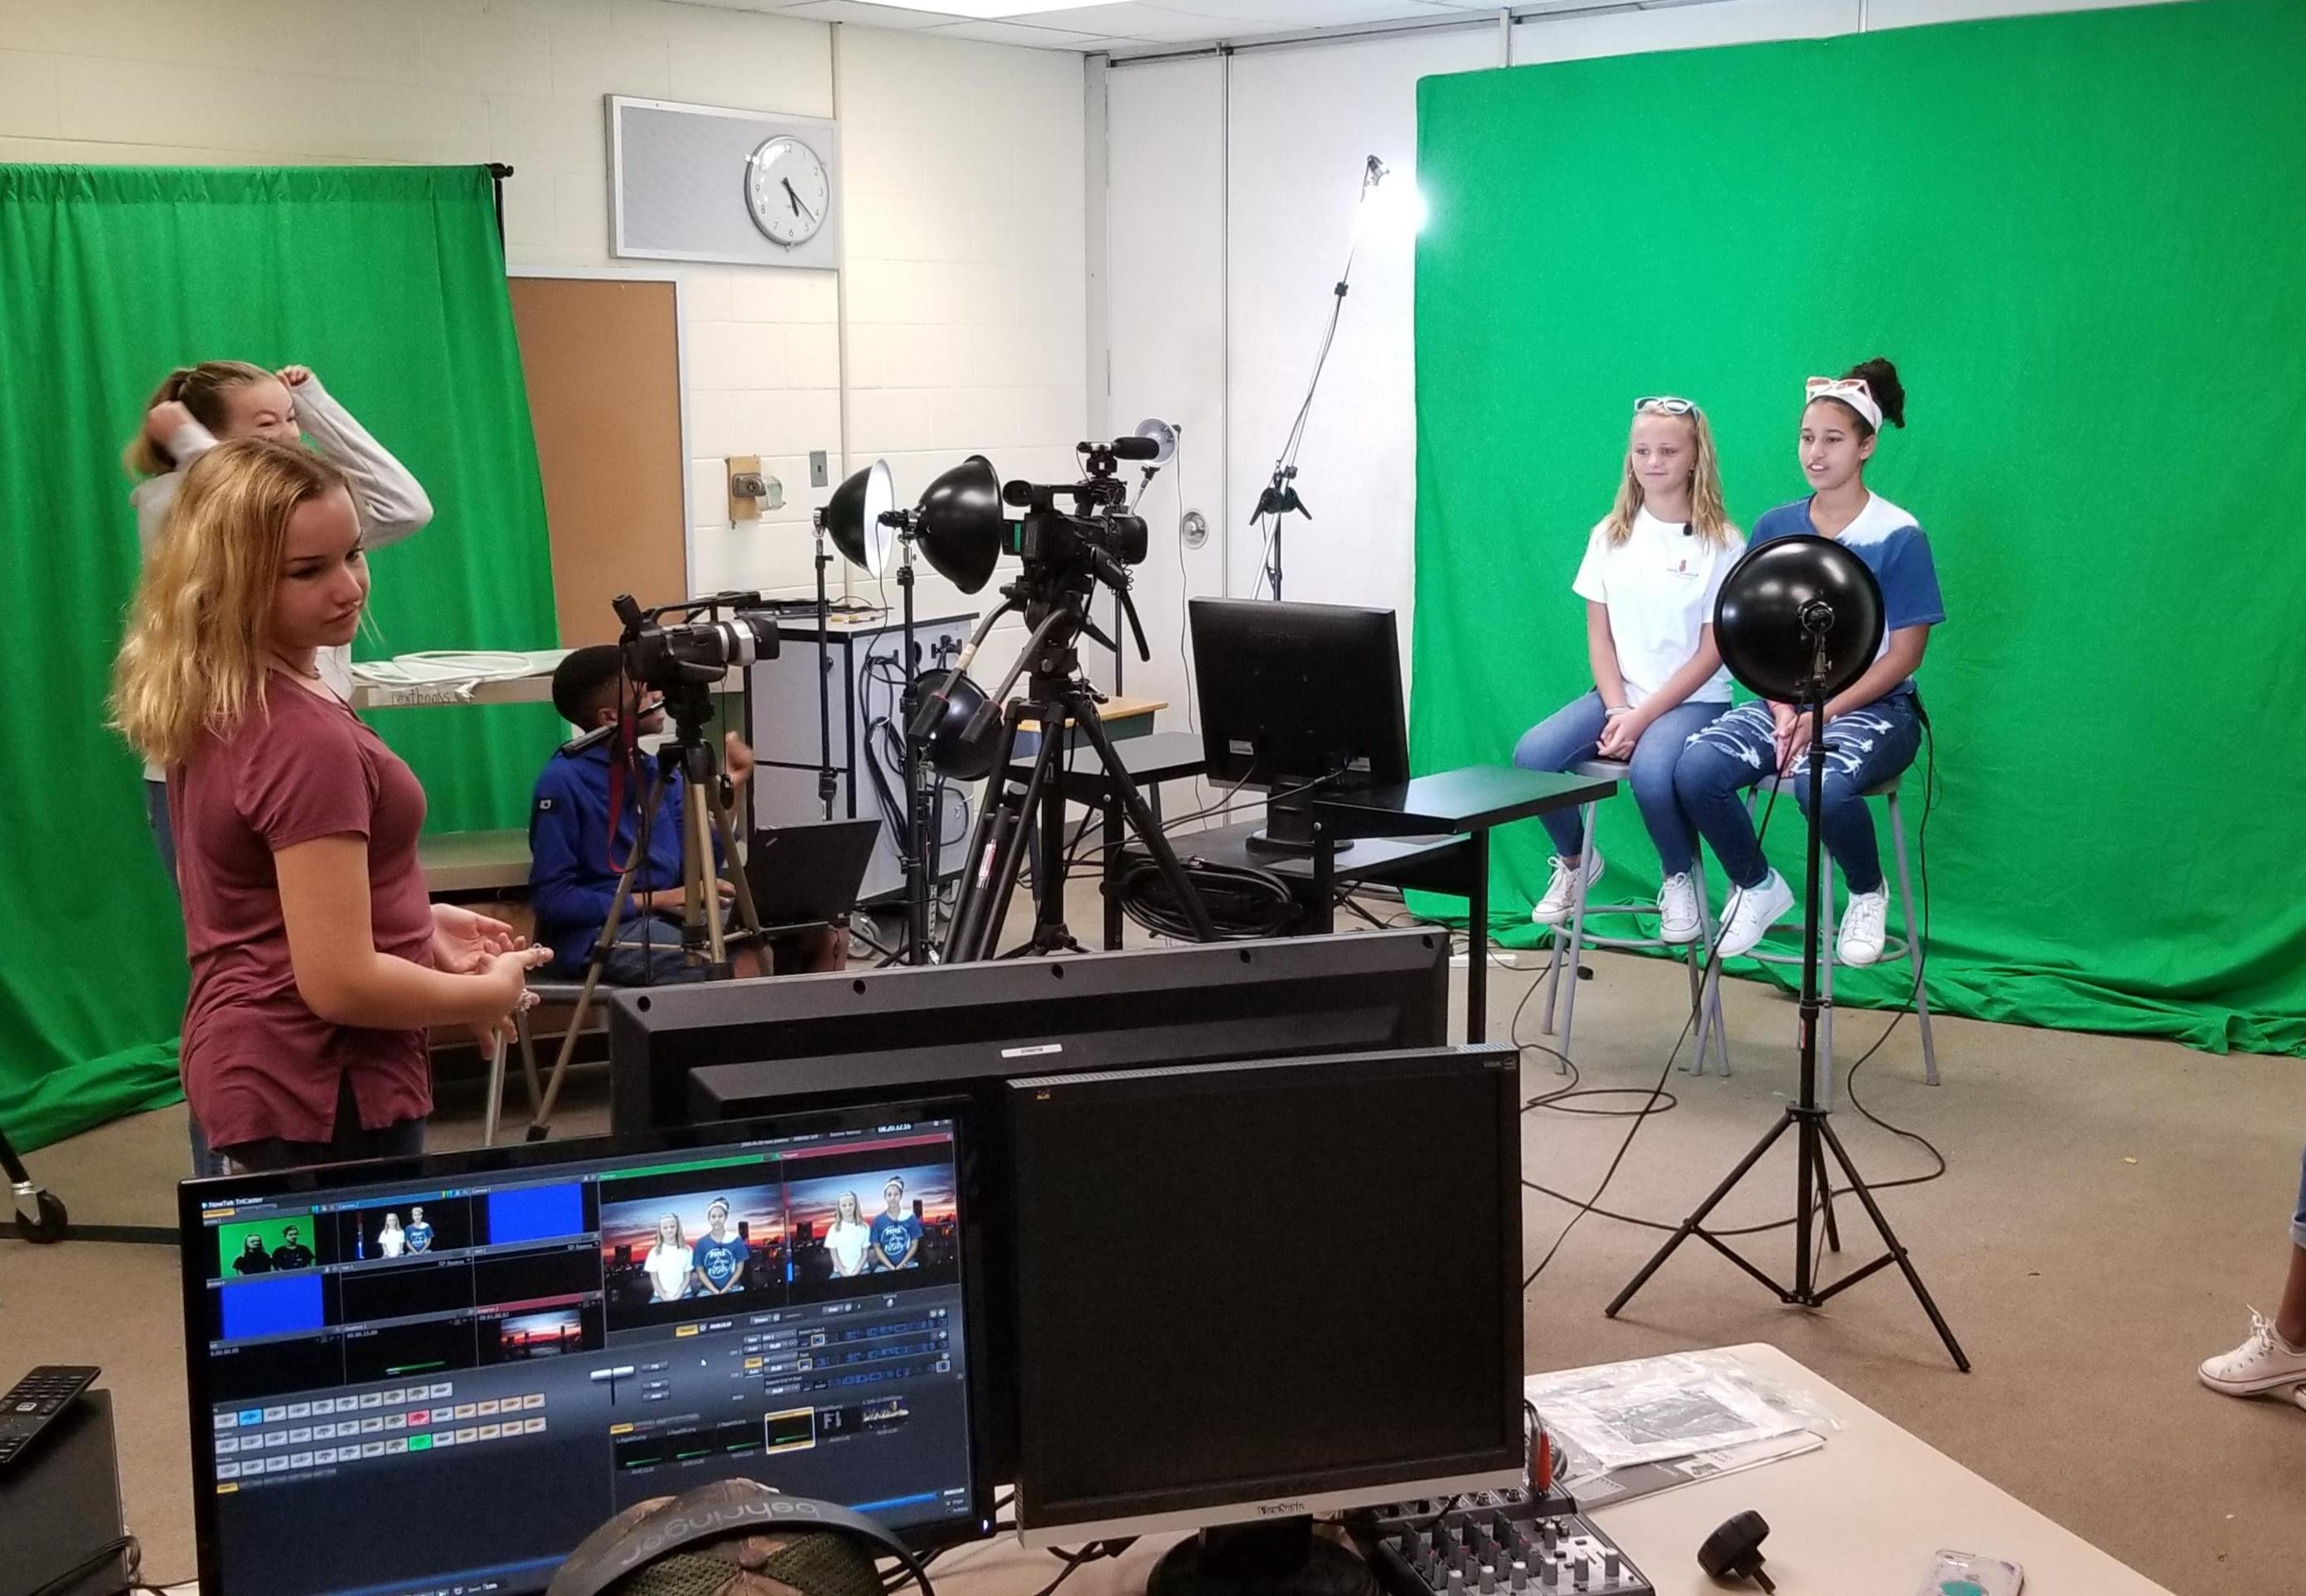 The Reidsville Middle School News room